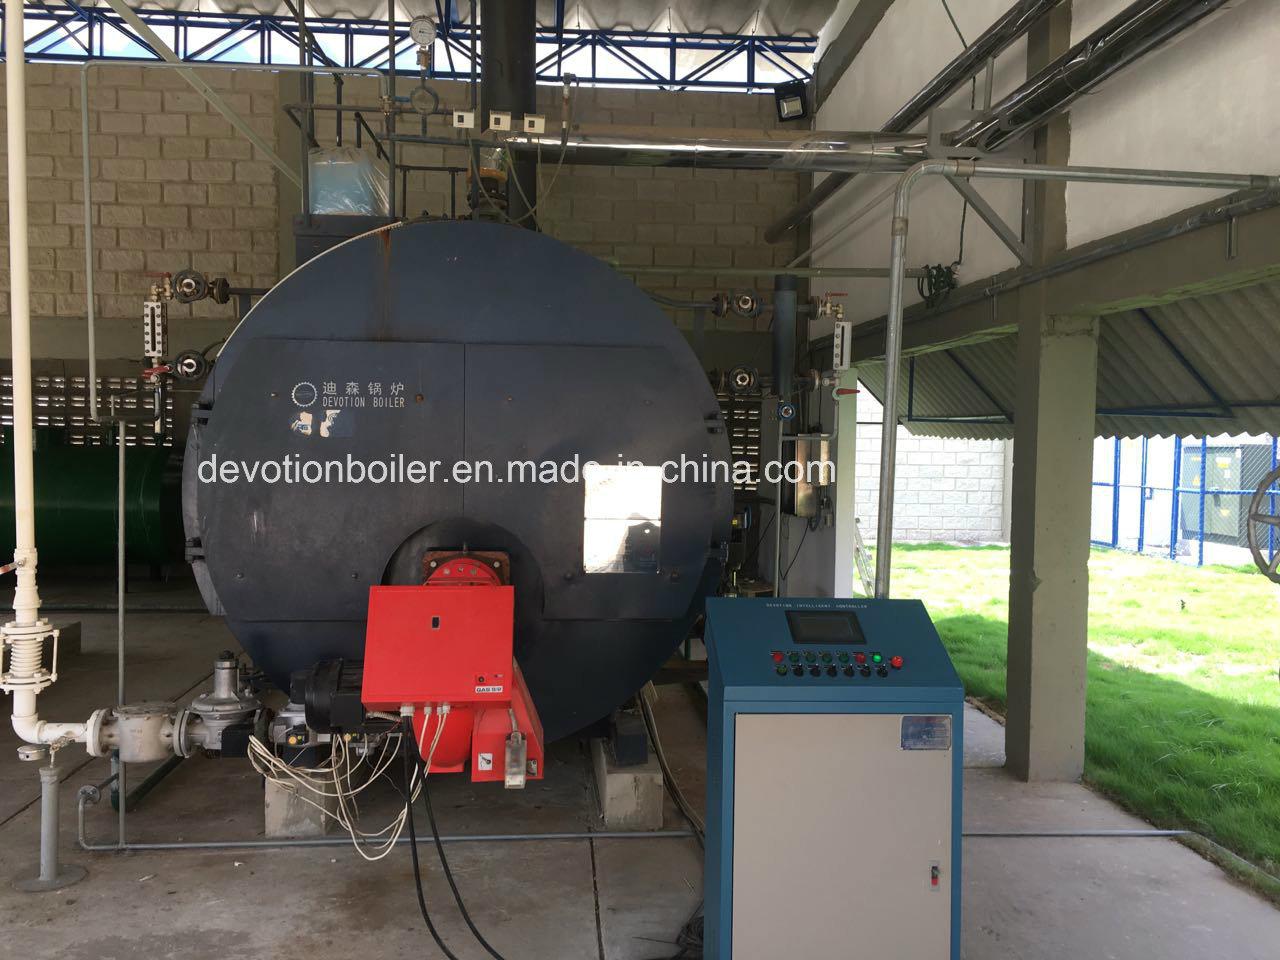 China Free Attendance & Maintenance Fire Tube Steam Boiler - China ...